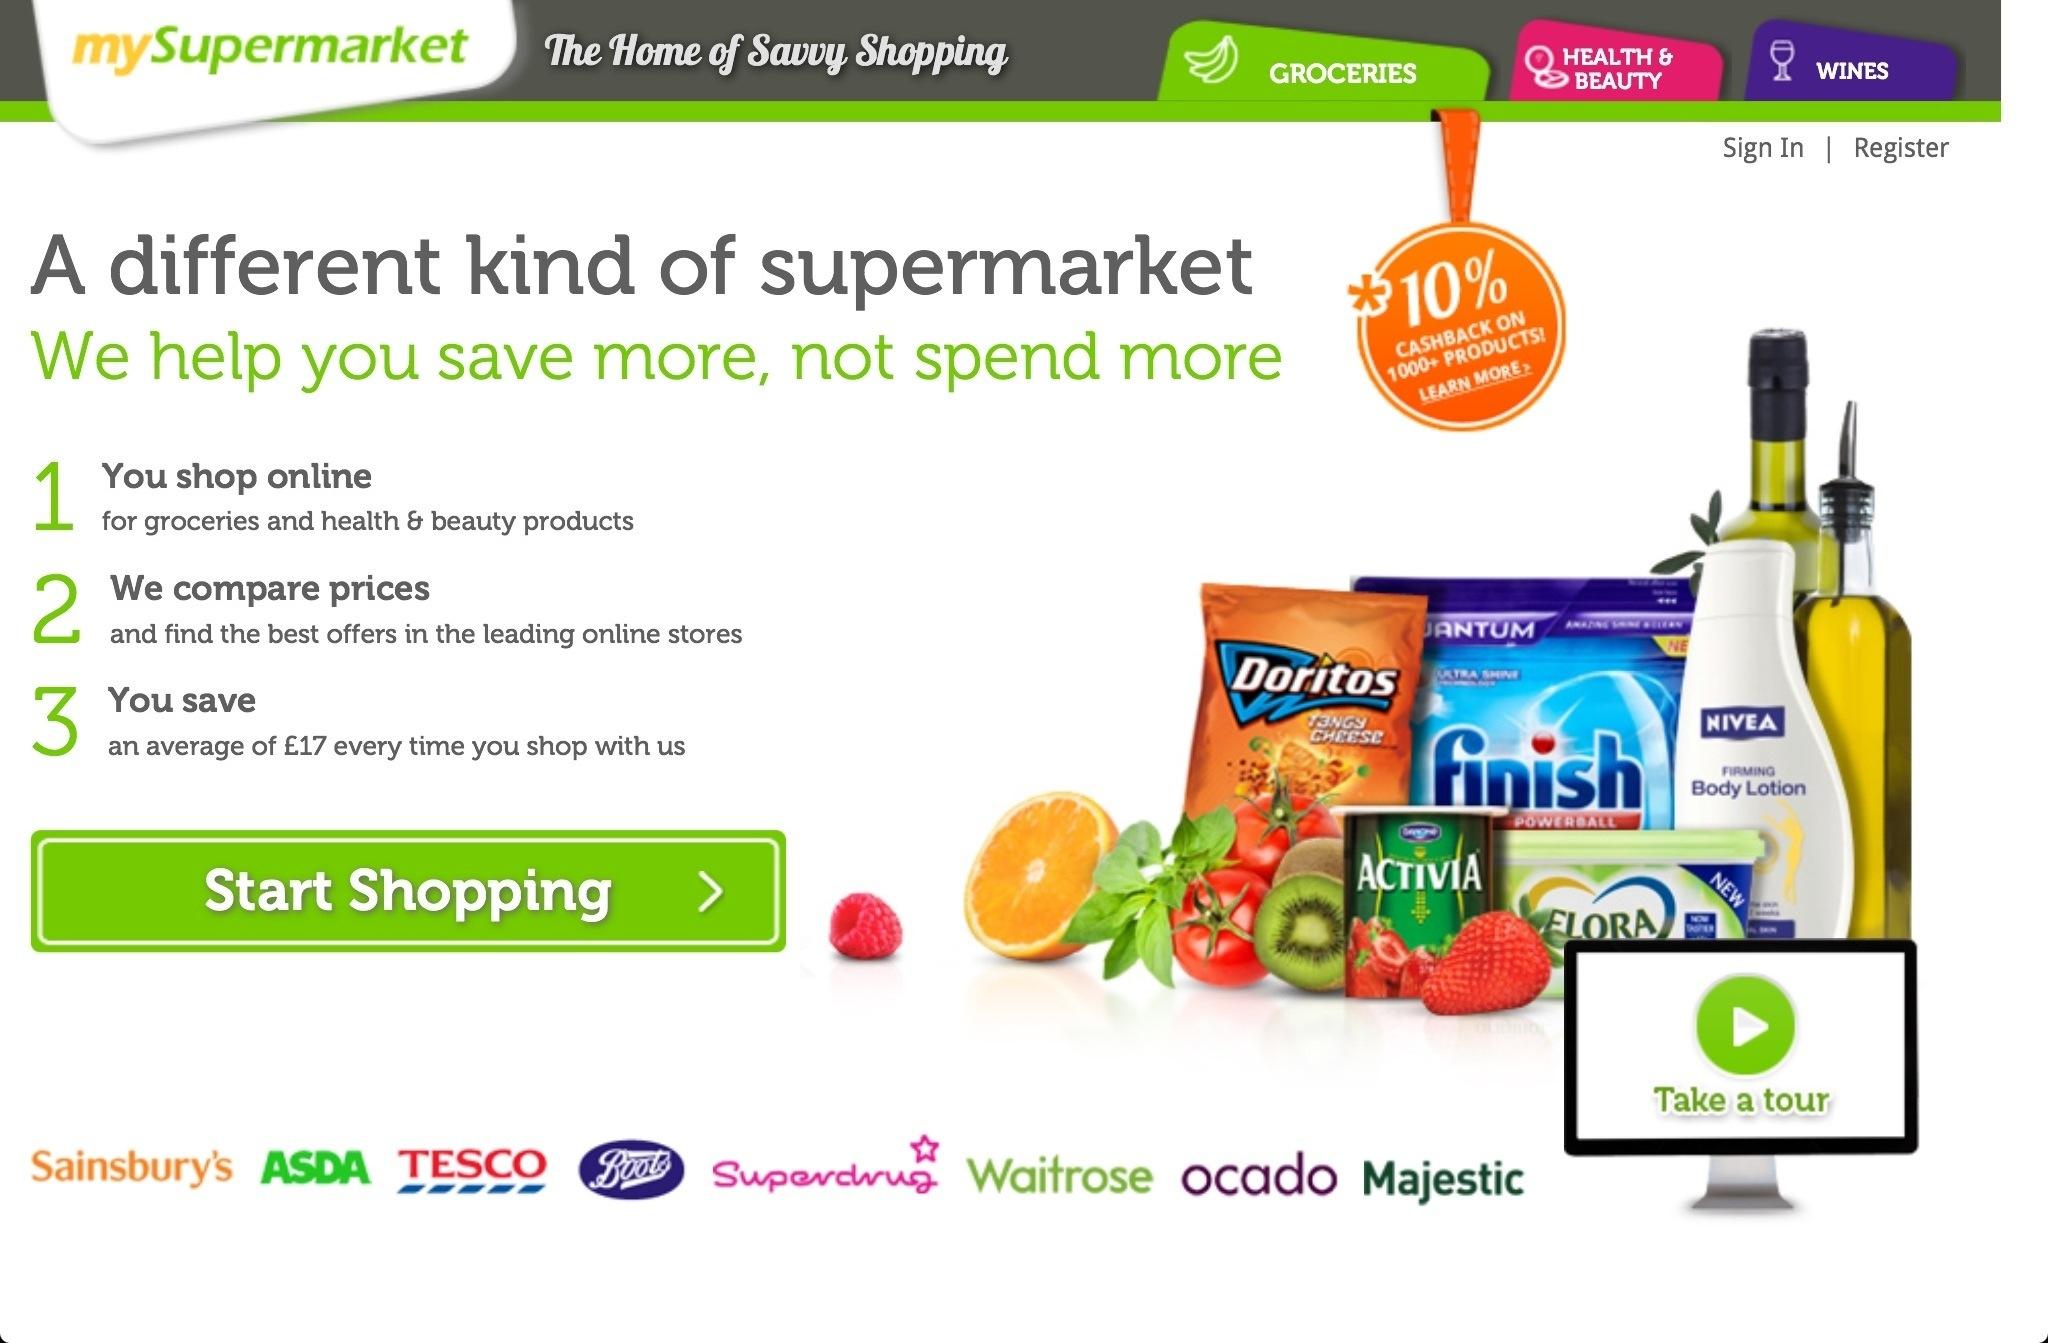 Price-check: $7.4M for mySupermarket | VatorNews